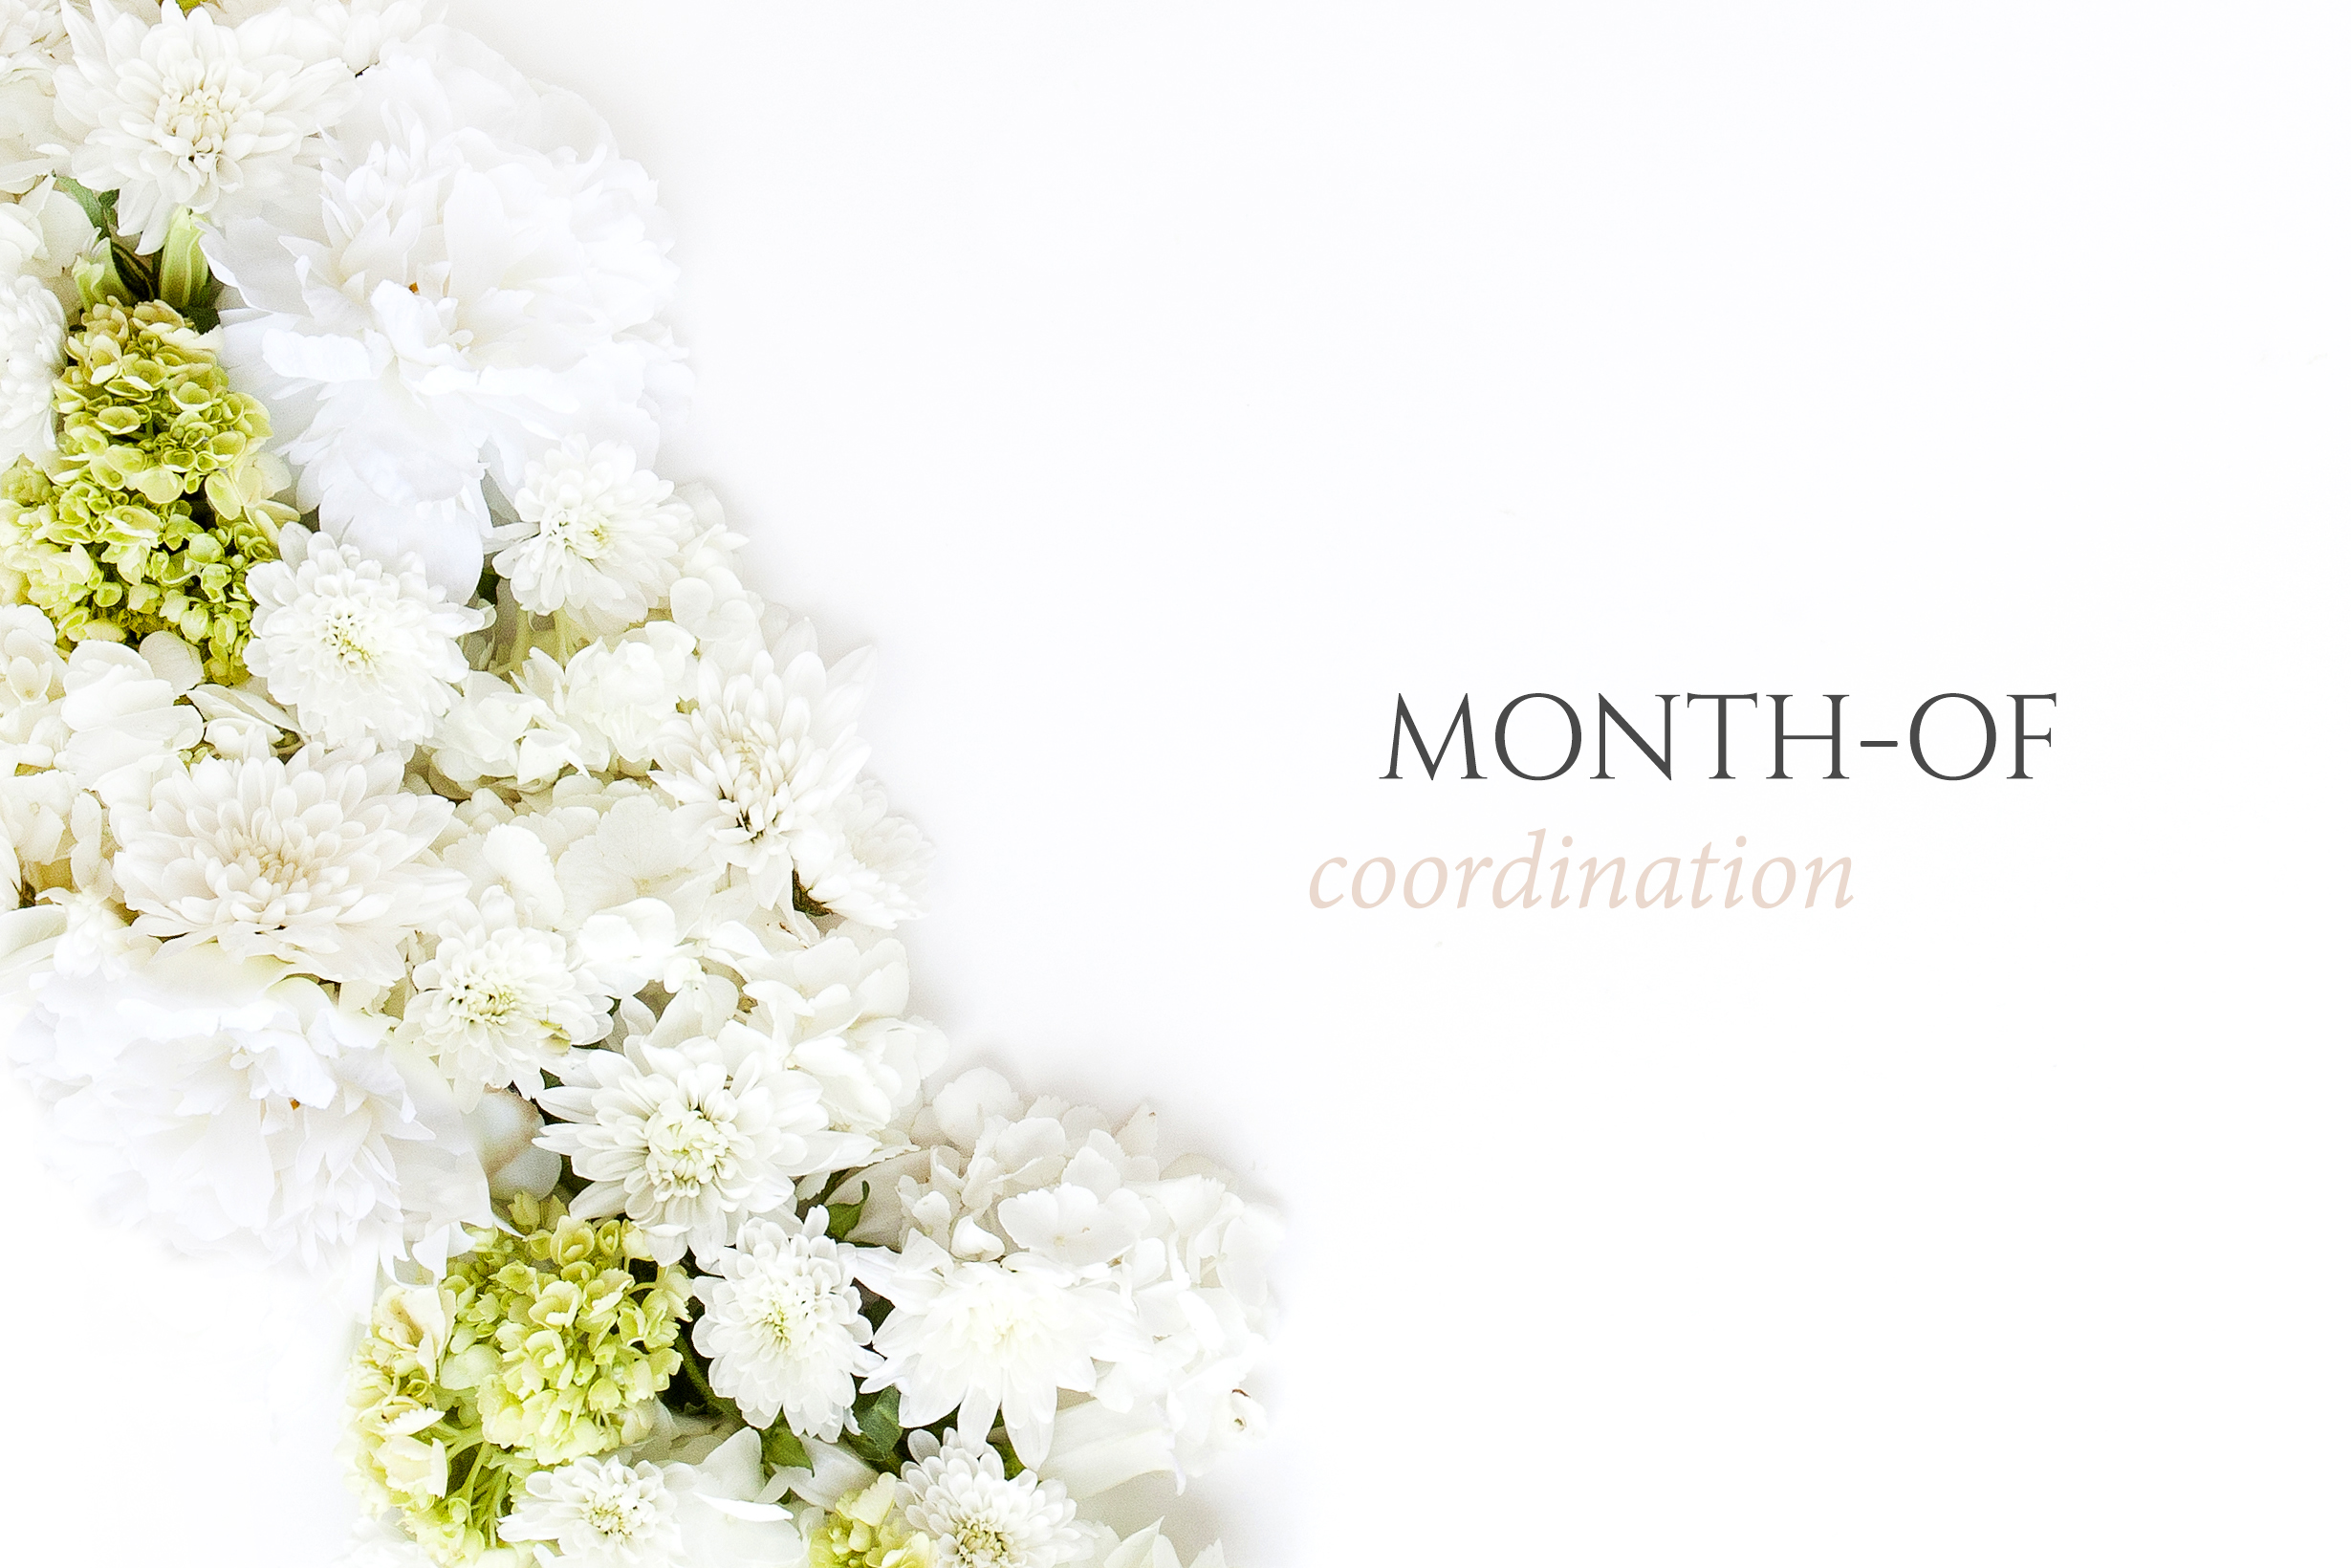 Month of coordination.jpg